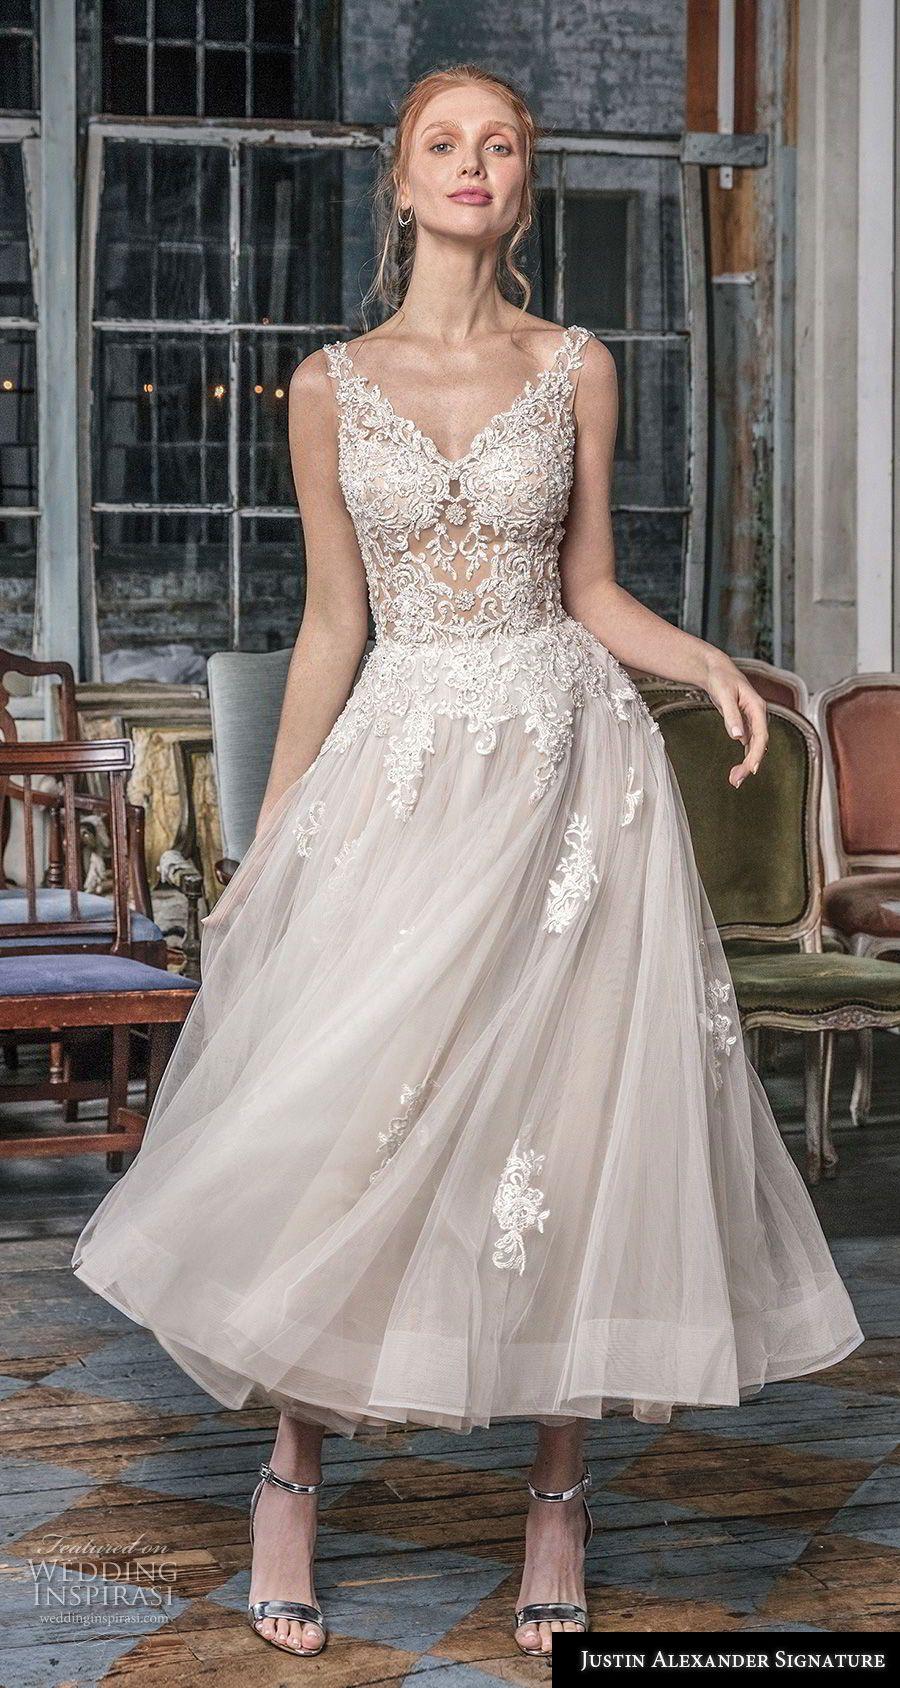 Justin Alexander Signature Fall 2018 Wedding Dresses Wedding Inspirasi Tea Length Wedding Dresses Lace Short Wedding Dress Lace Top Wedding Dress [ 1688 x 900 Pixel ]